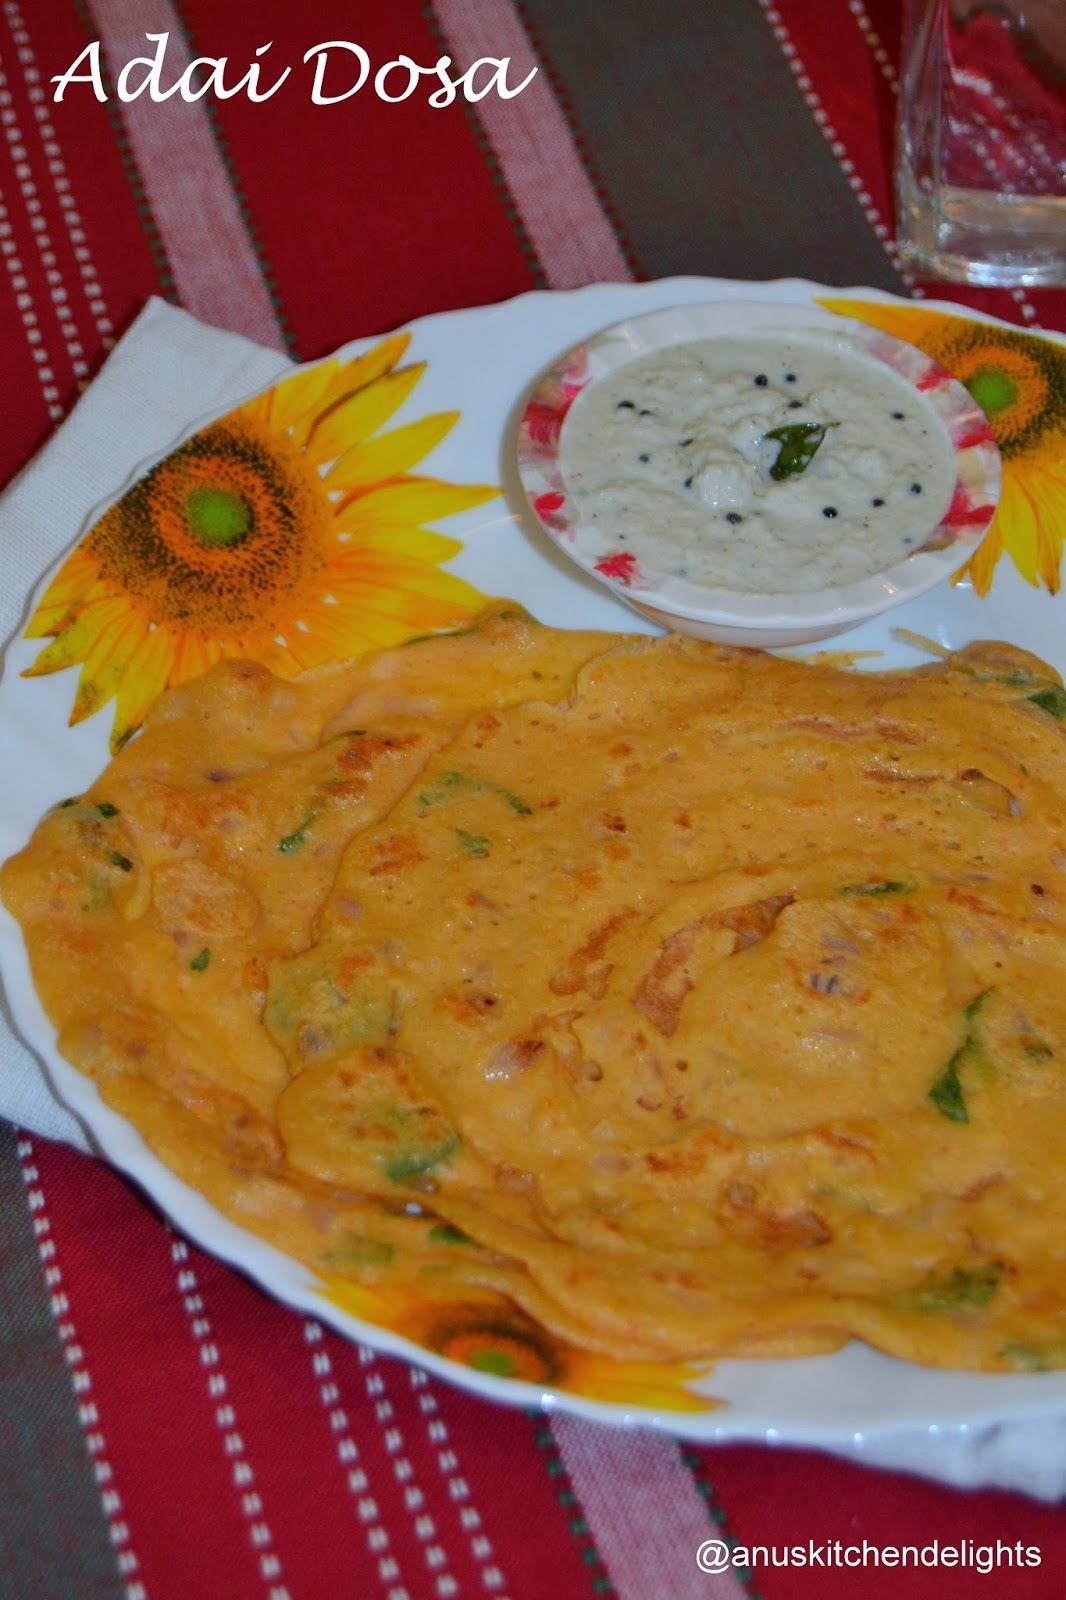 Adai Dosa - Mixed Lentil pancakes